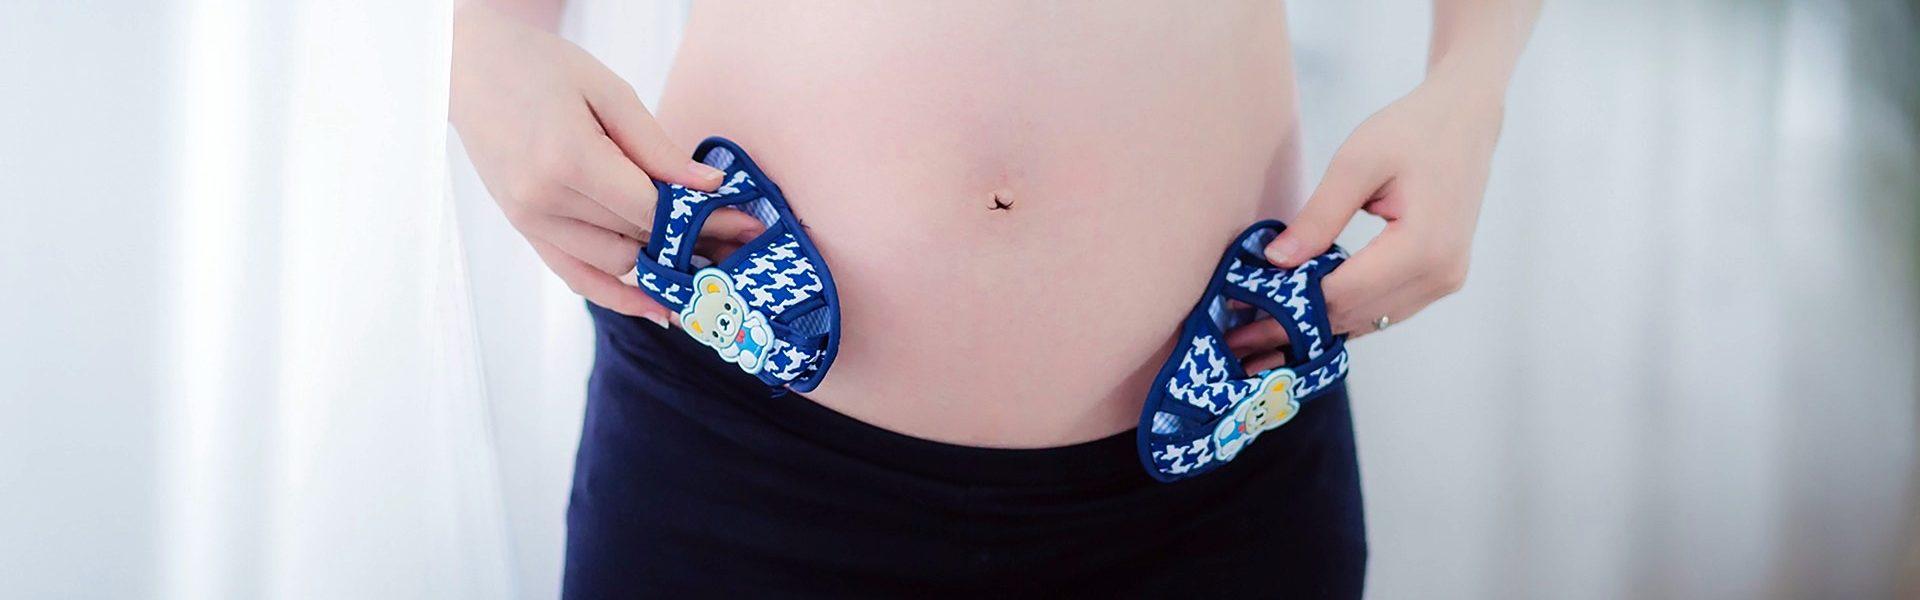 ciąża mama brzuch buciki